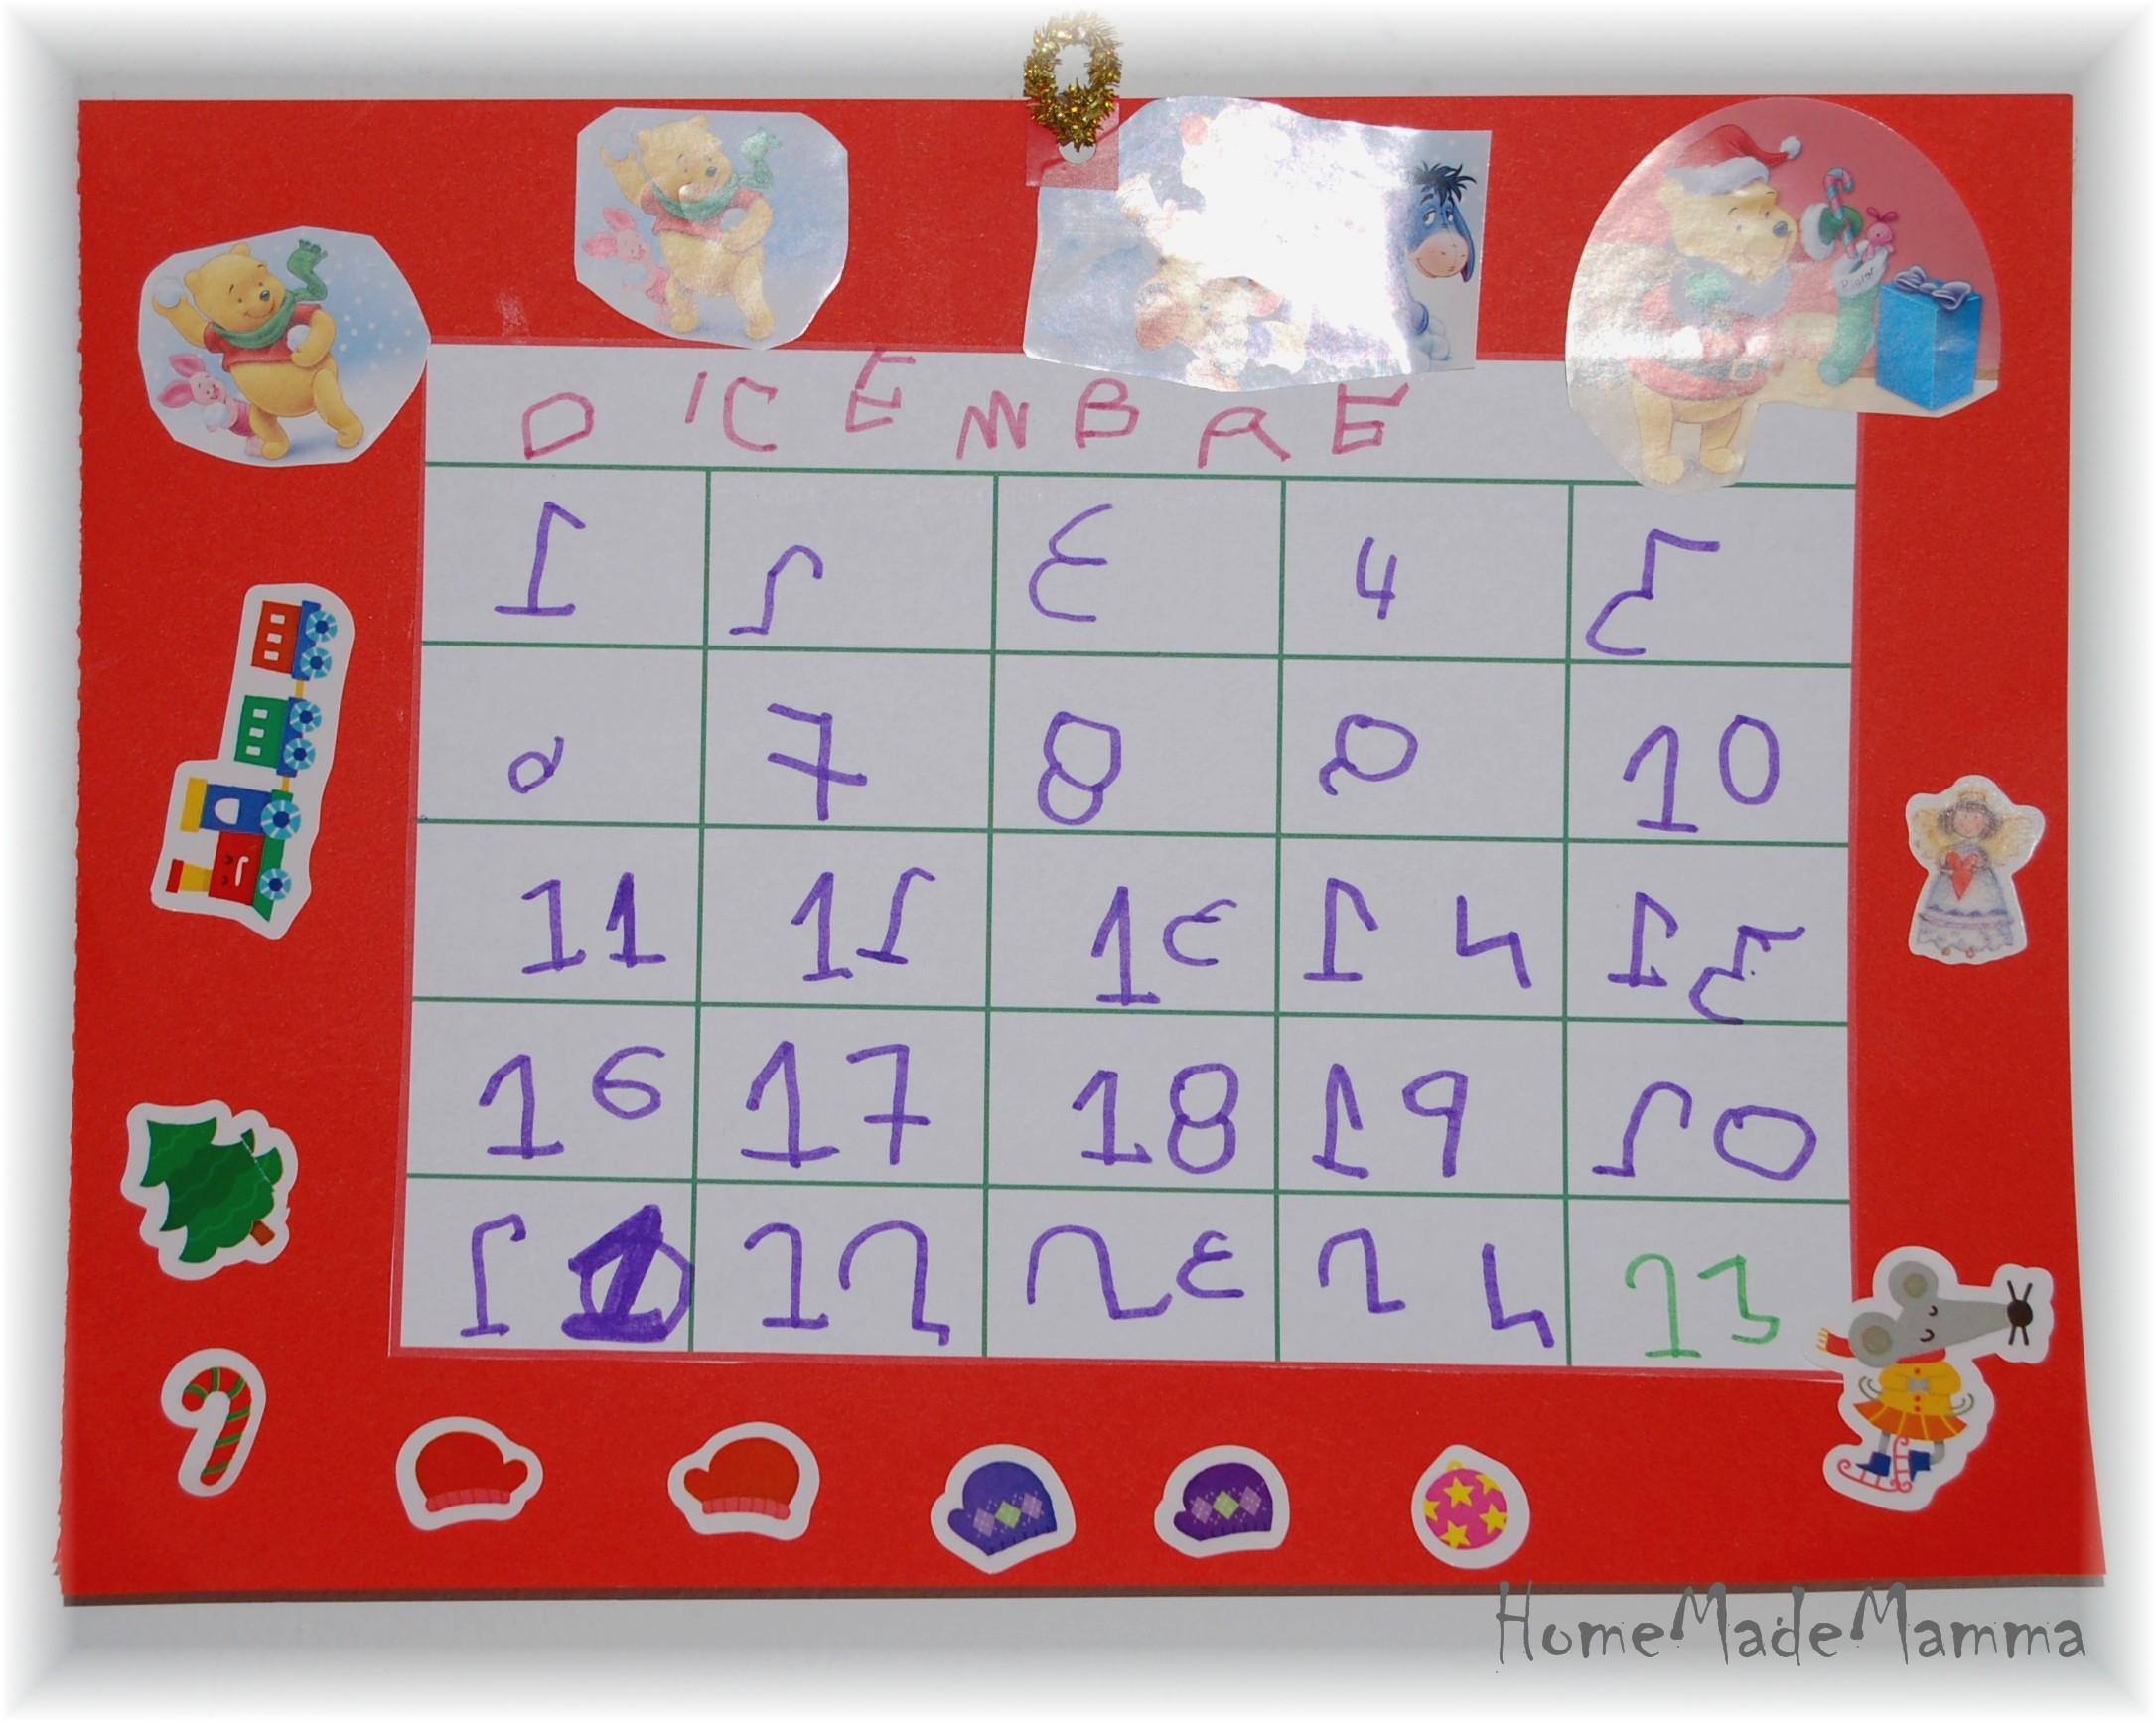 Eccezionale Numeri E Lettere | - Part 19 FP14